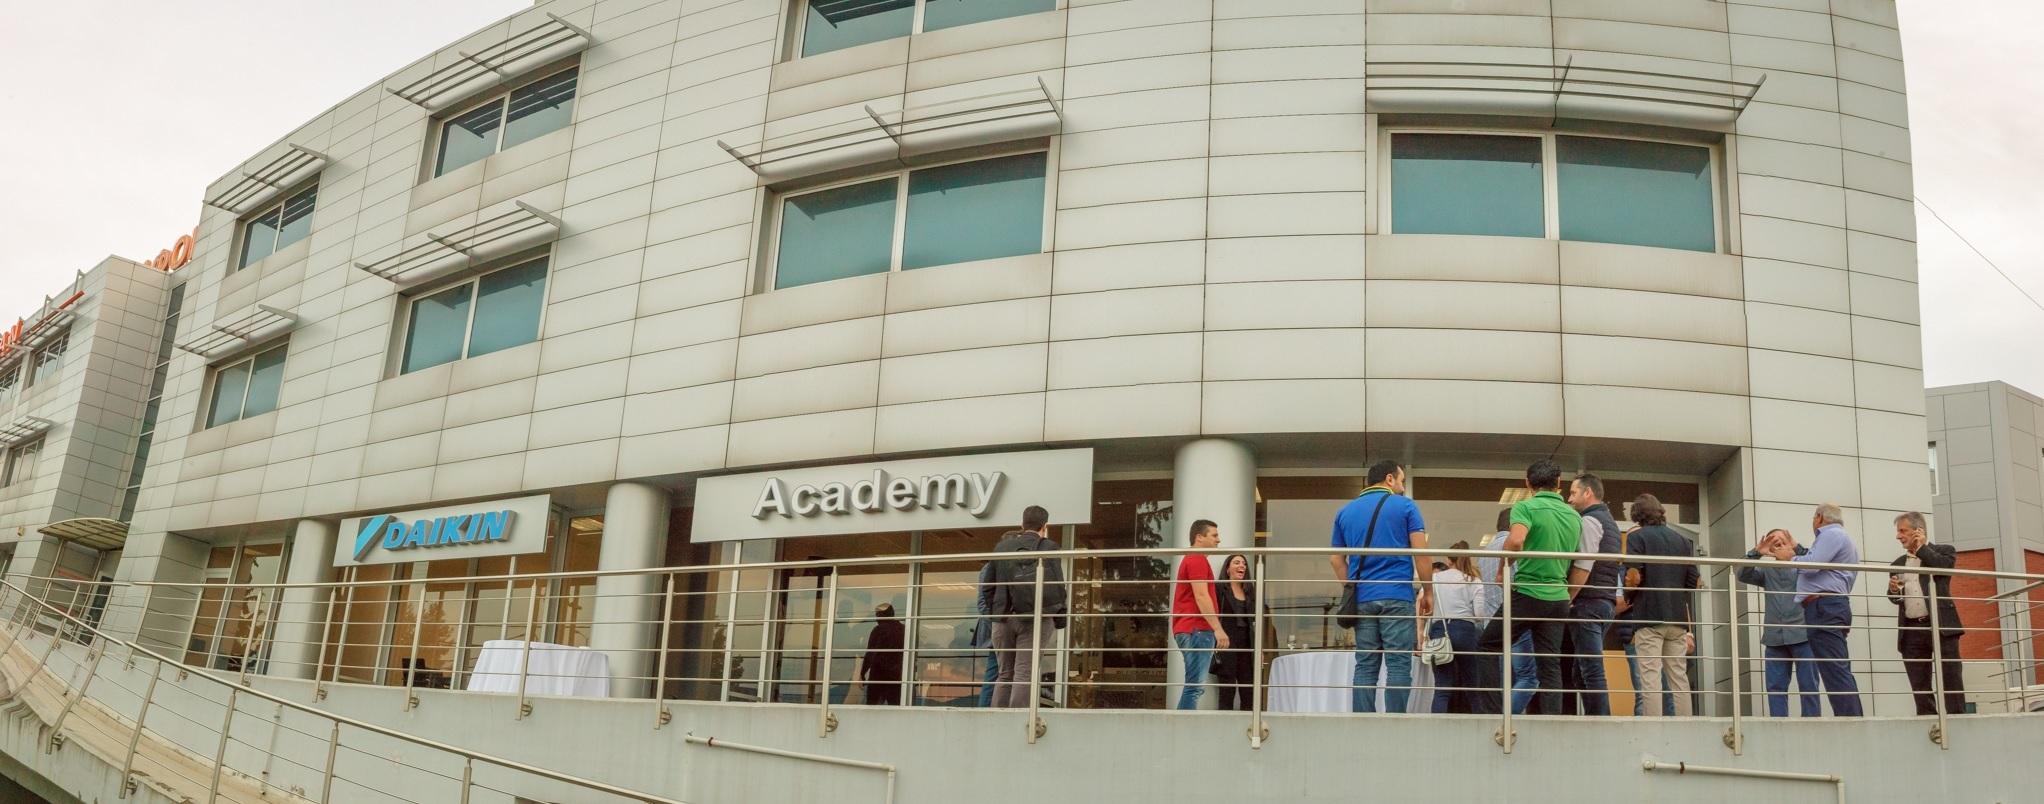 2098074f6661 Δεύτερη χρονιά επιτυχημένης πορείας για την Daikin Academy – EnergyIn